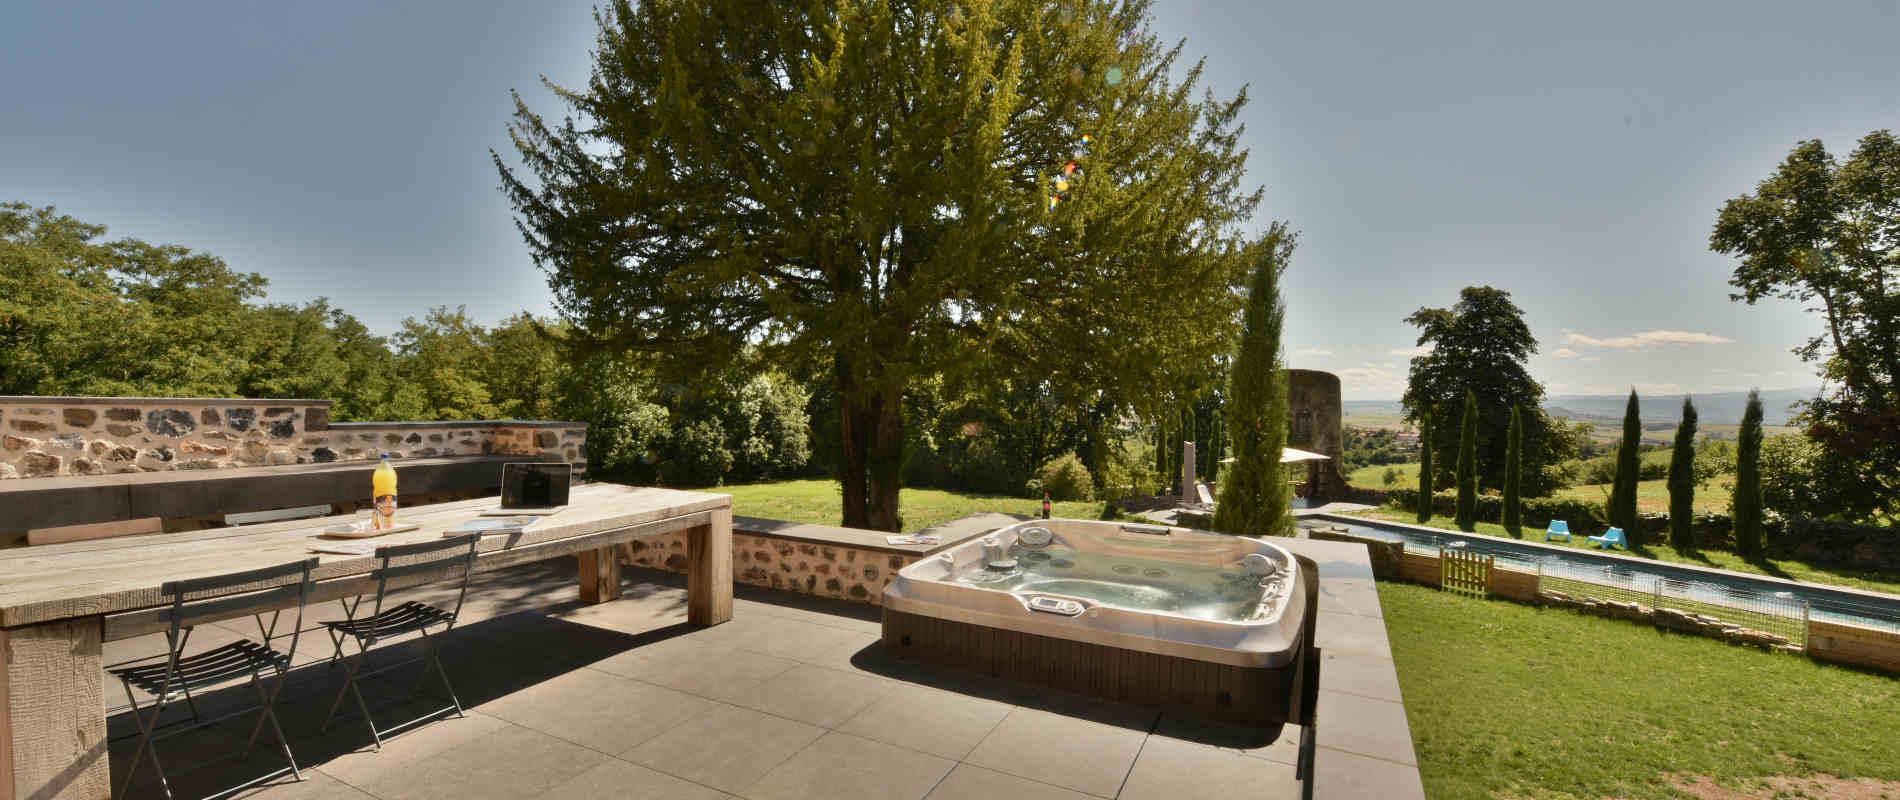 Outdoor jacuzzi and wellness area of Château de Bois Rigaud